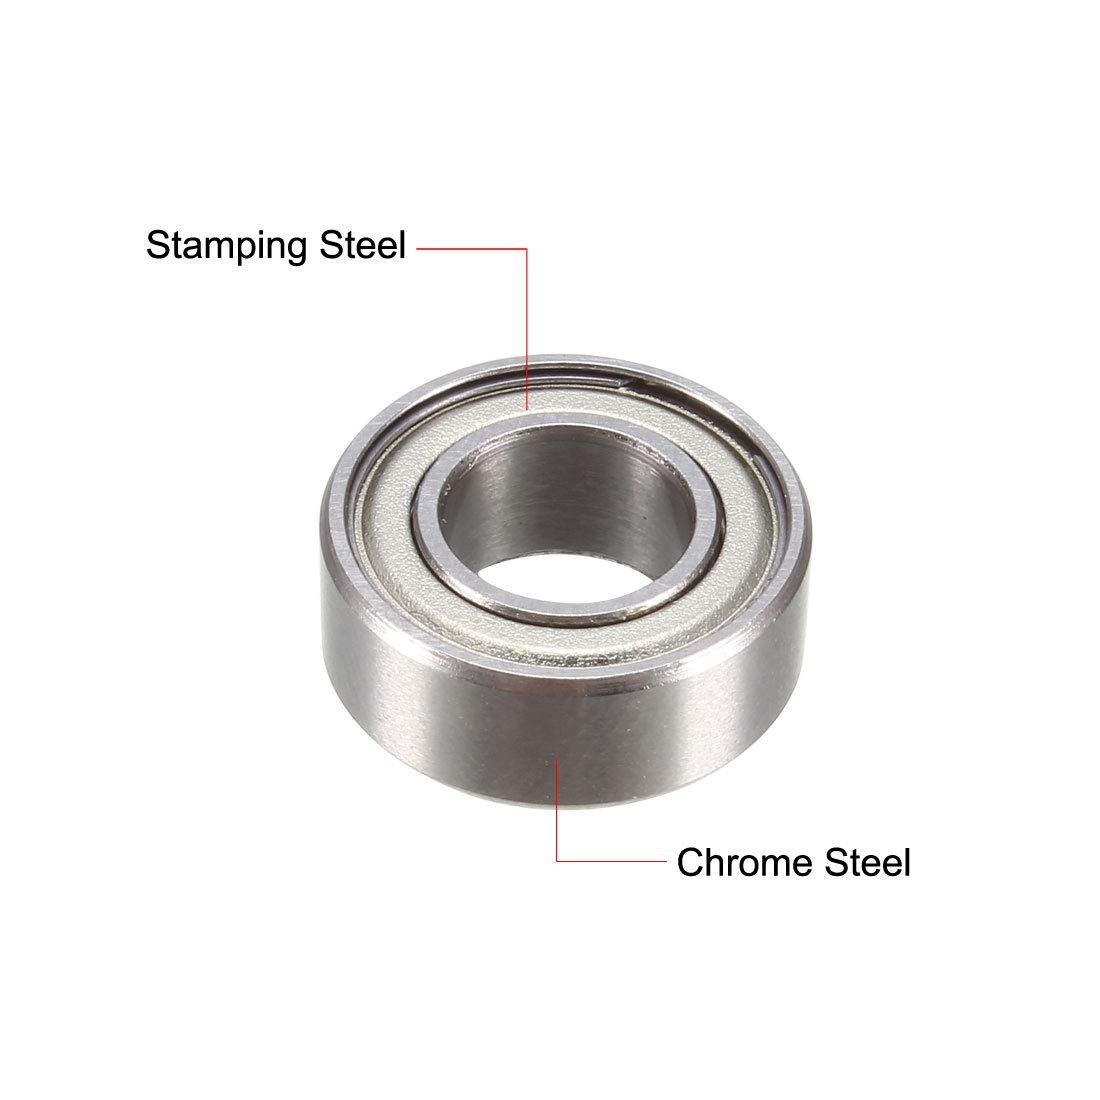 uxcell/® FR188ZZ Flange Ball Bearing 1//4x1//2x3//16 Shielded Chrome Steel Z2 Lever Bearings 5pcs